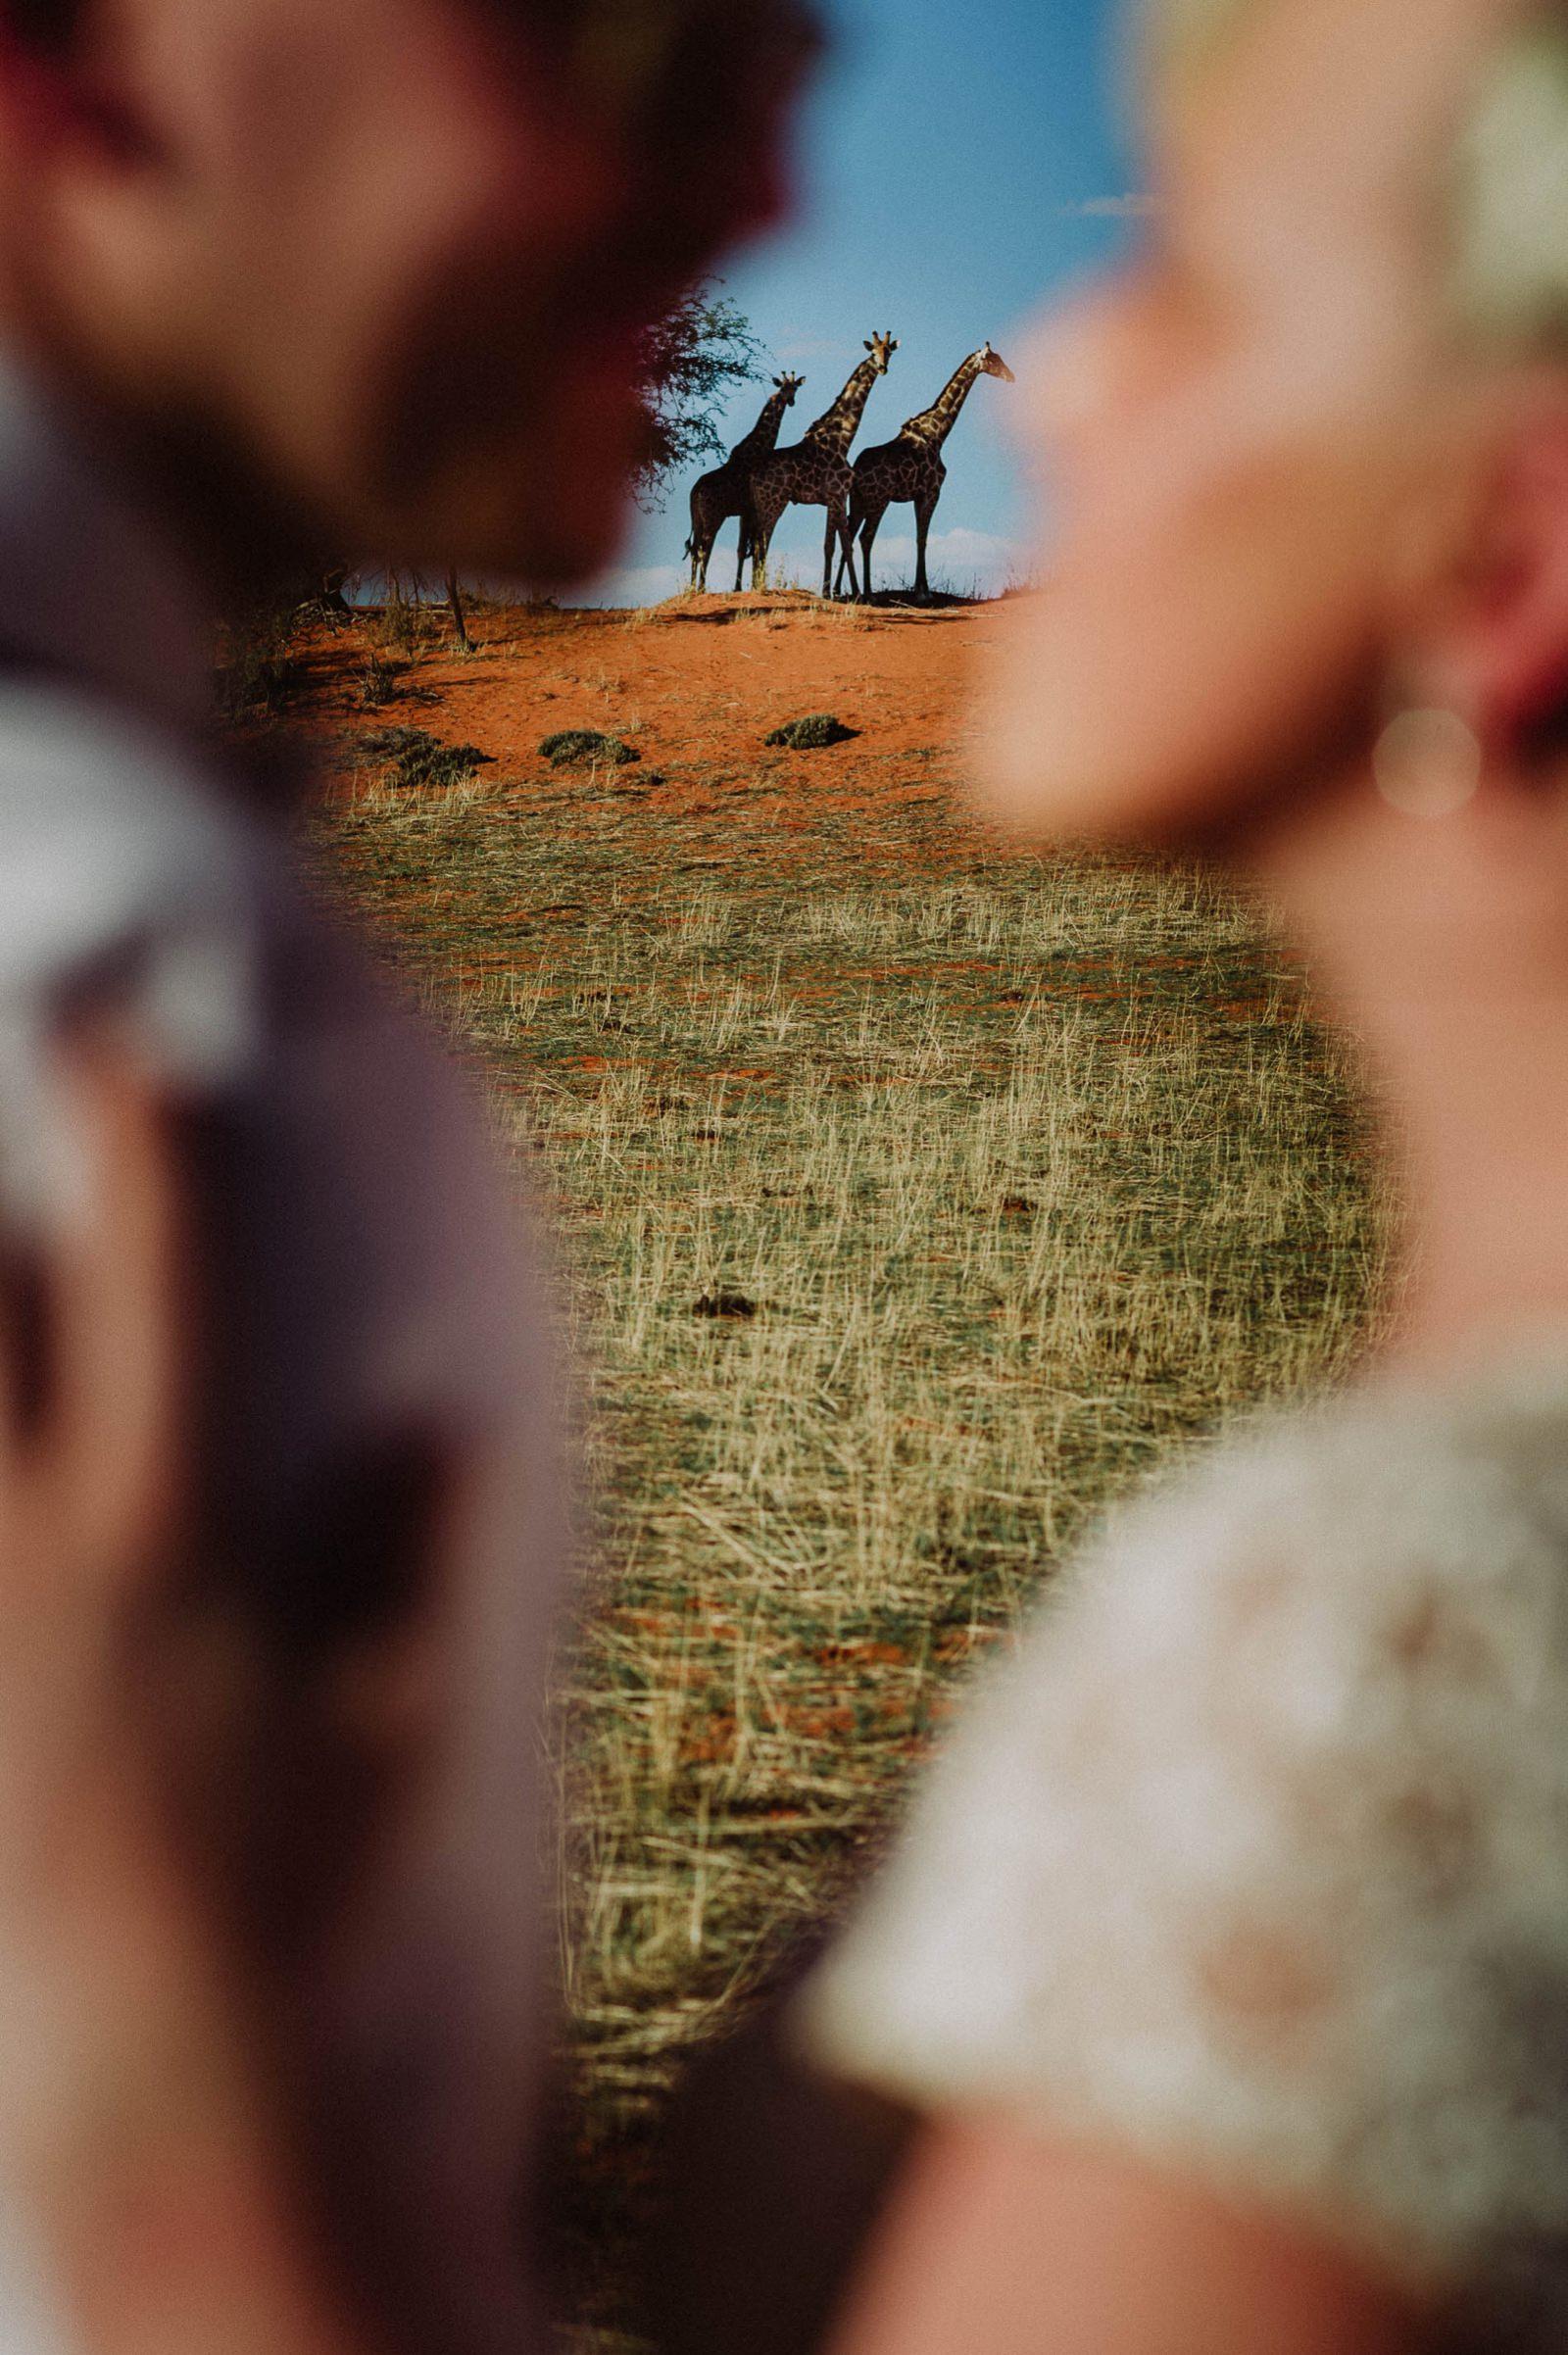 heiraten-in-namibia-7657.jpg